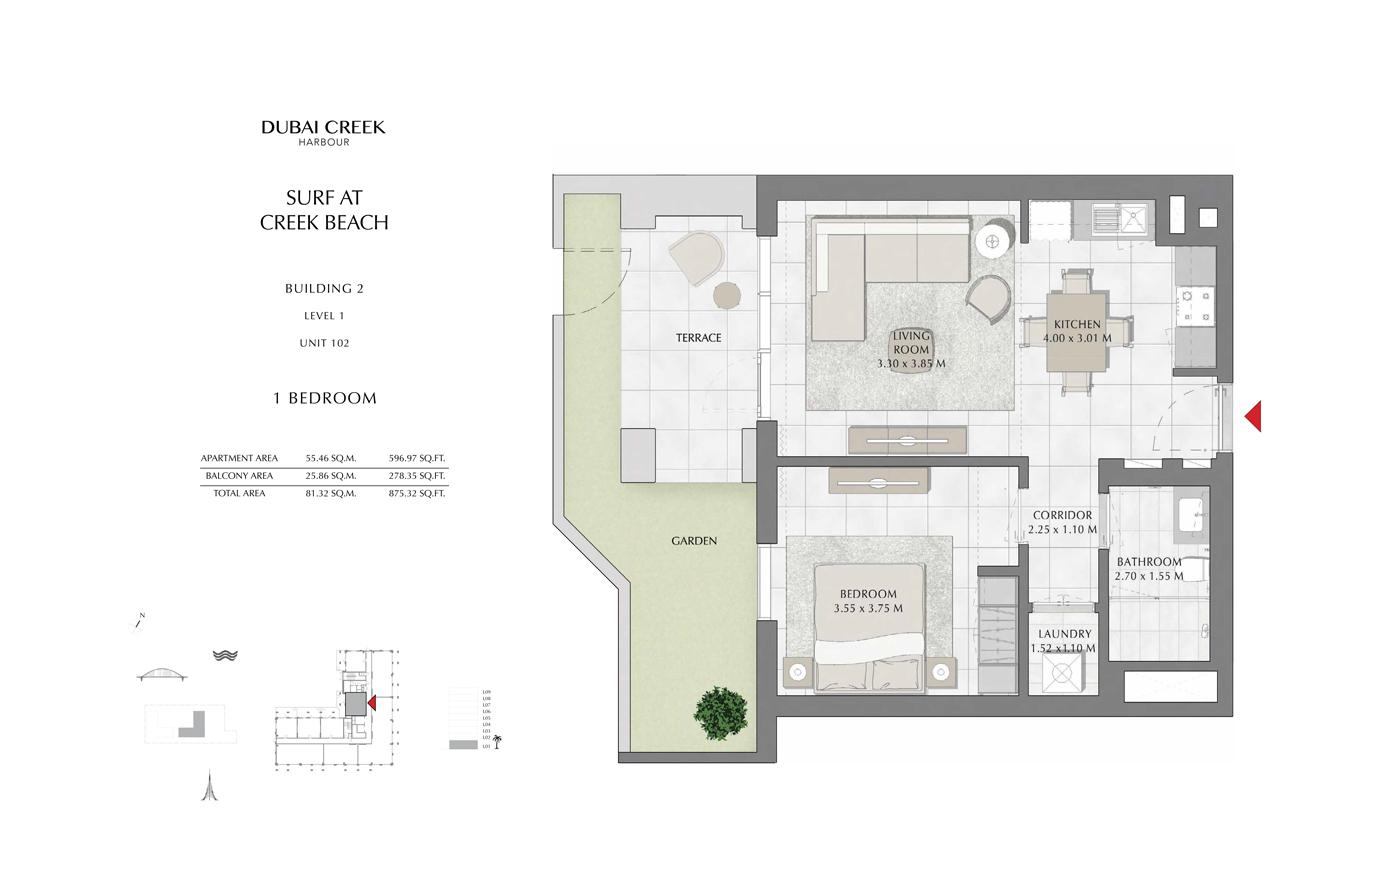 Building 2, 1 Bedroom Level 1, Unit 102, Size 875 Sq Ft